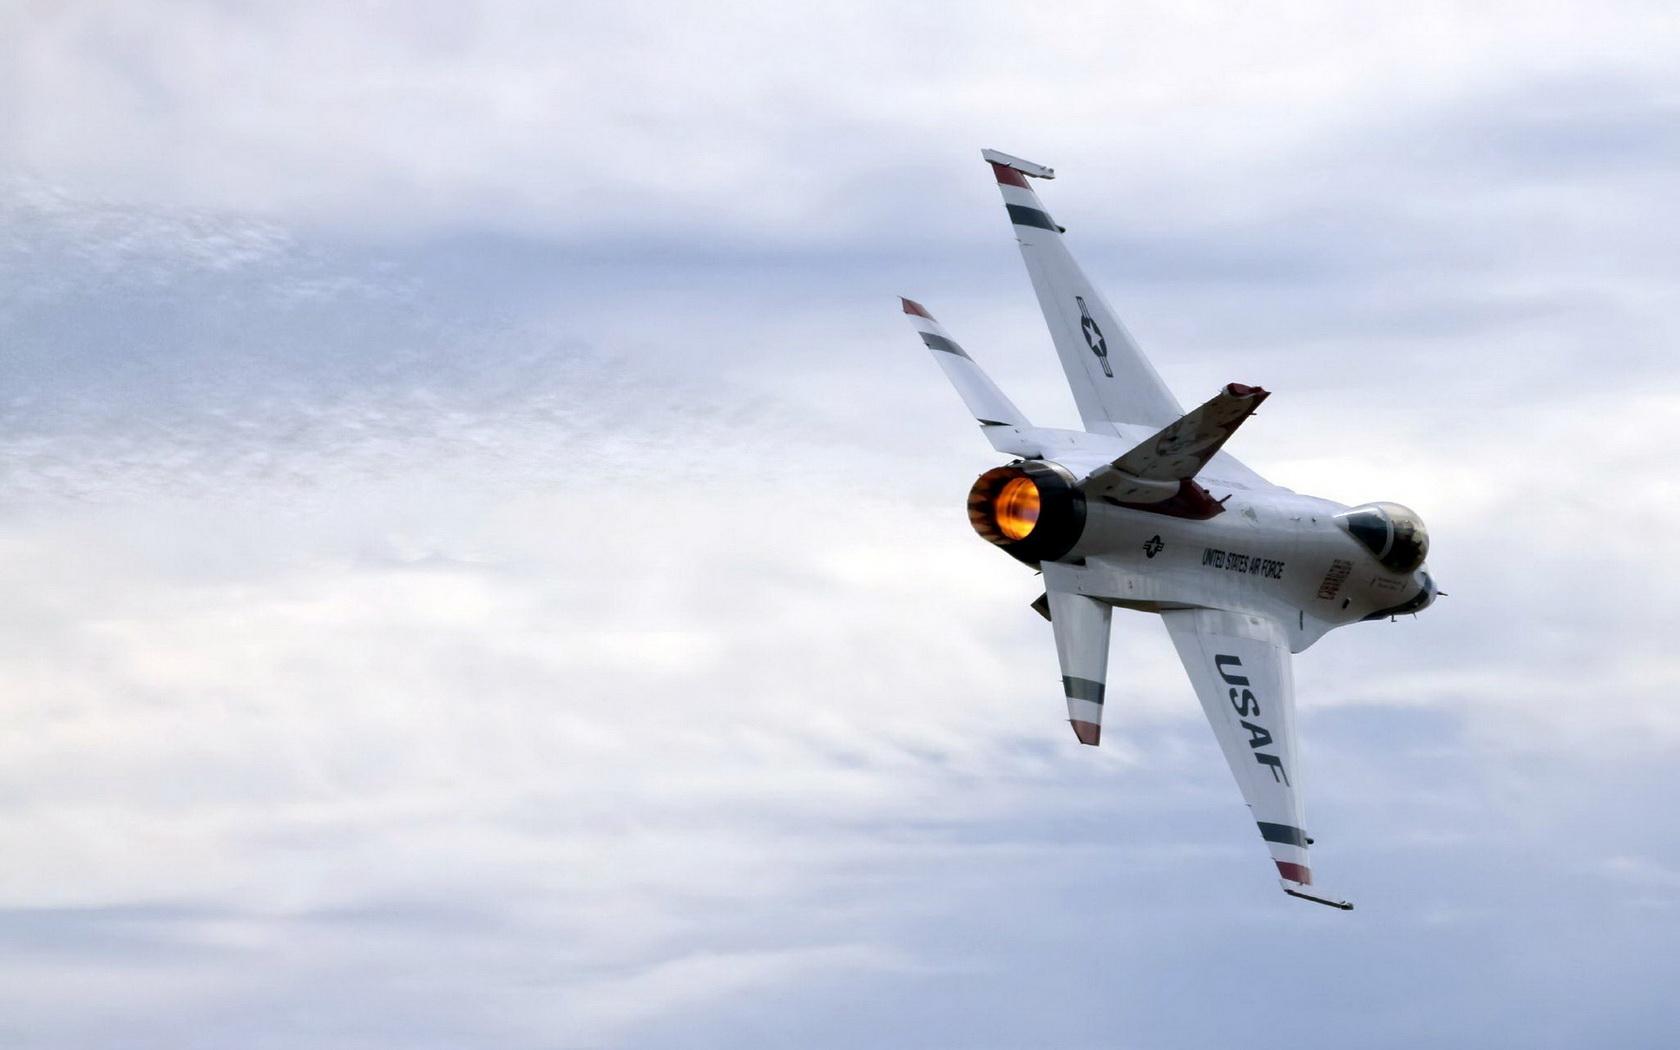 Avión militar volando - 1680x1050